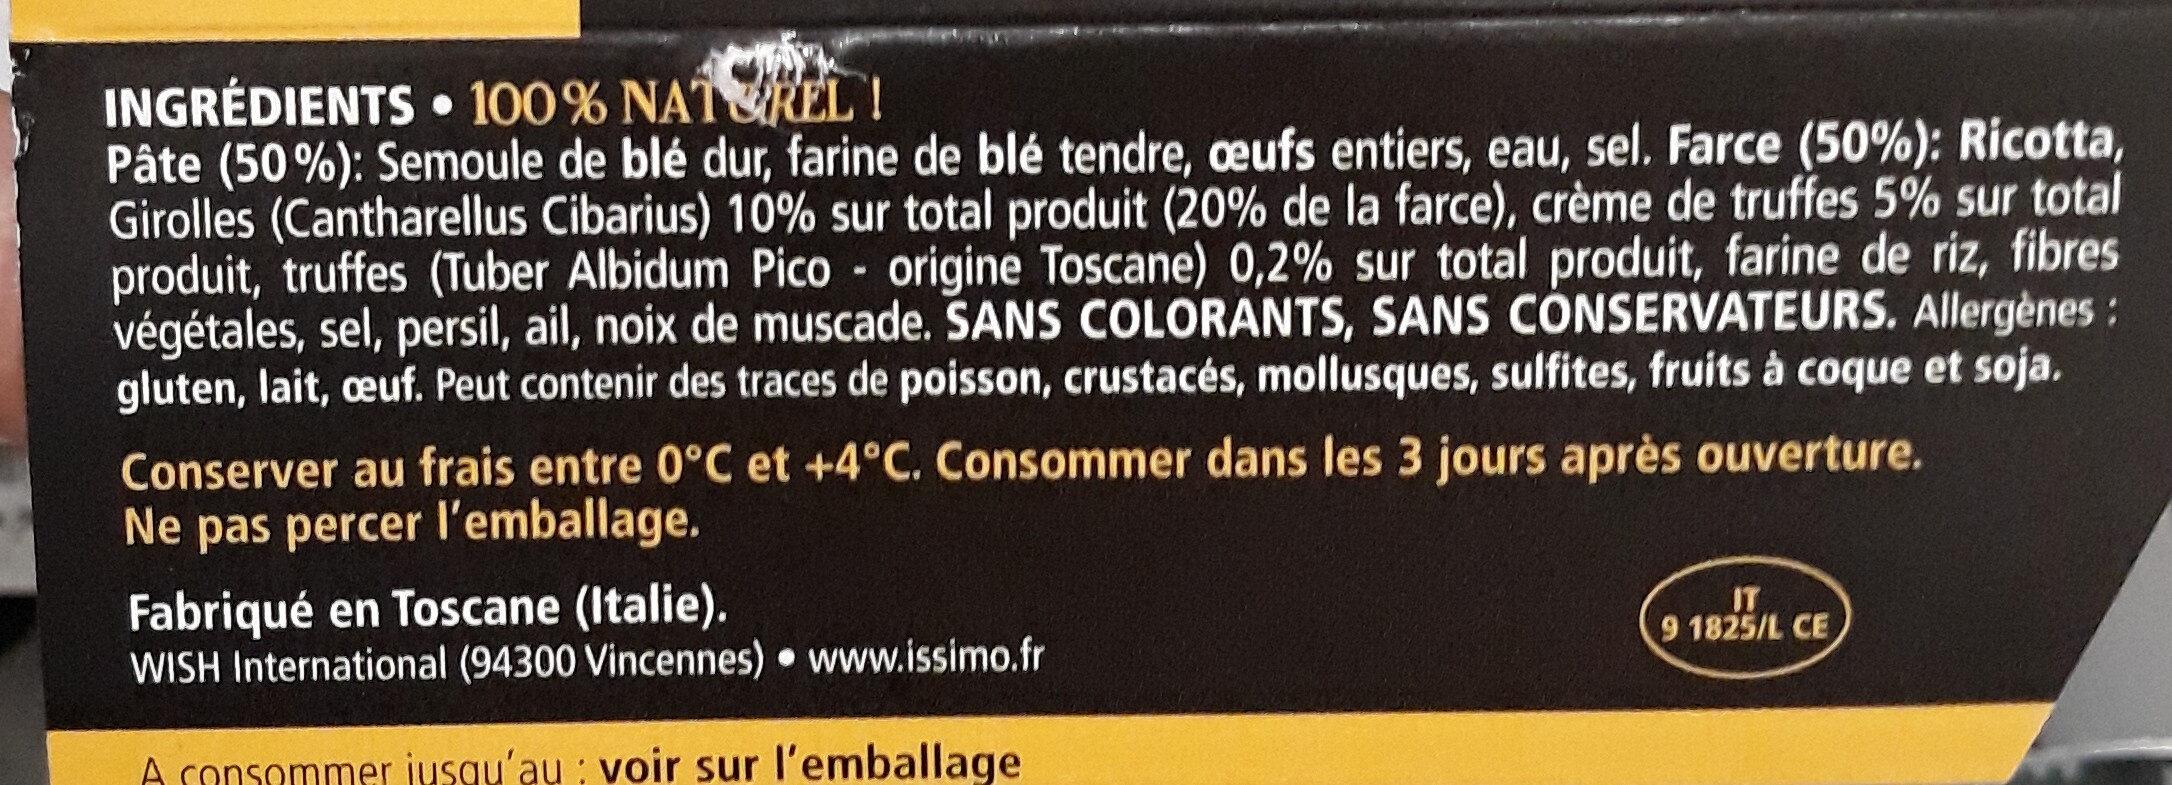 Issimo ravioli girolles et truffes de toscane - Ingredienti - fr